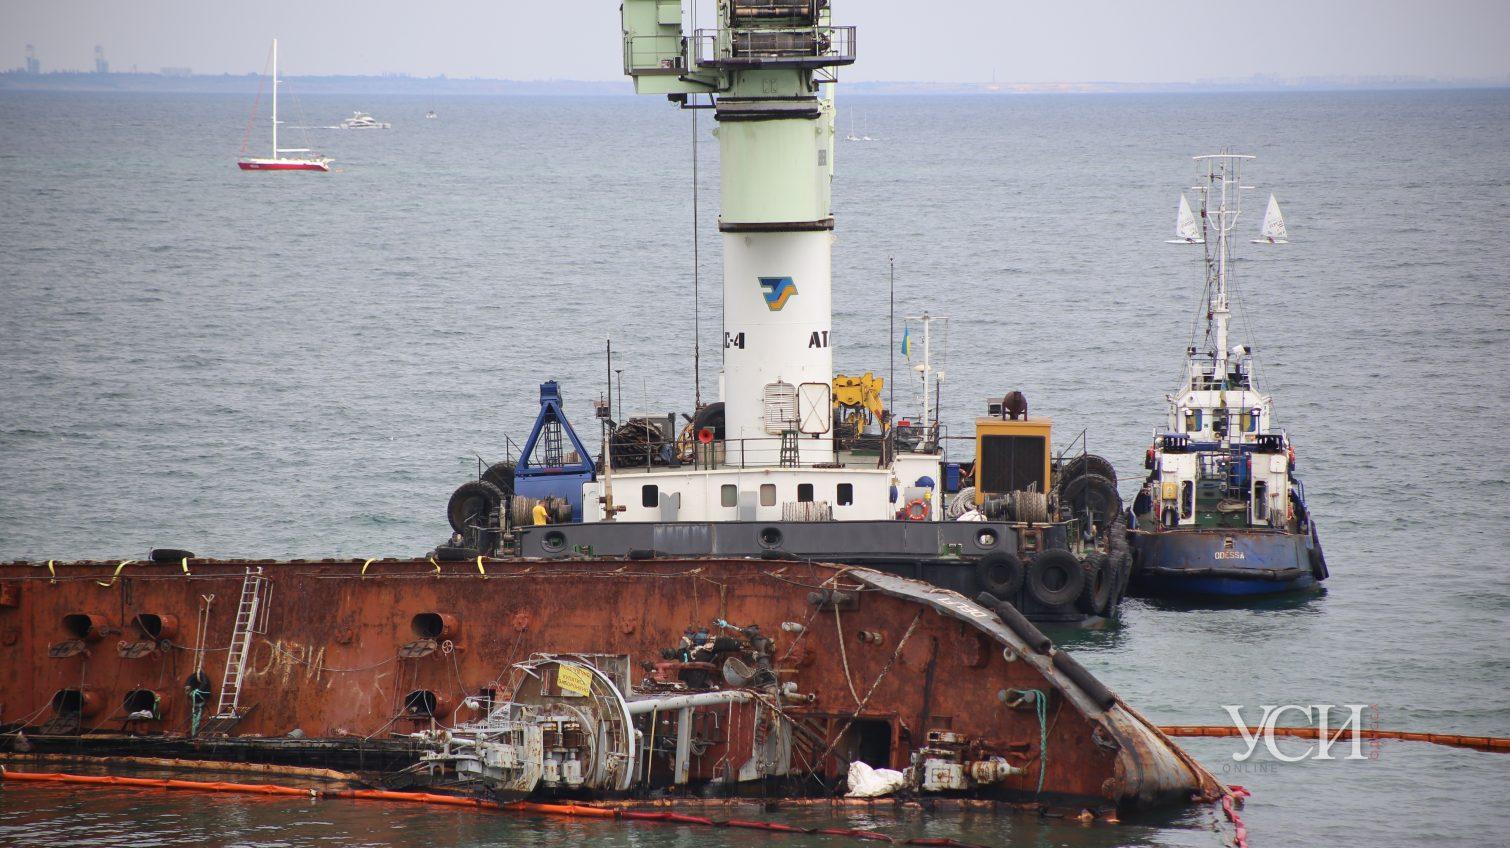 К затонувшему танкеру Delfi подогнали кран и пару буксиров  ОБНОВЛЕНО (фото, видео) «фото»